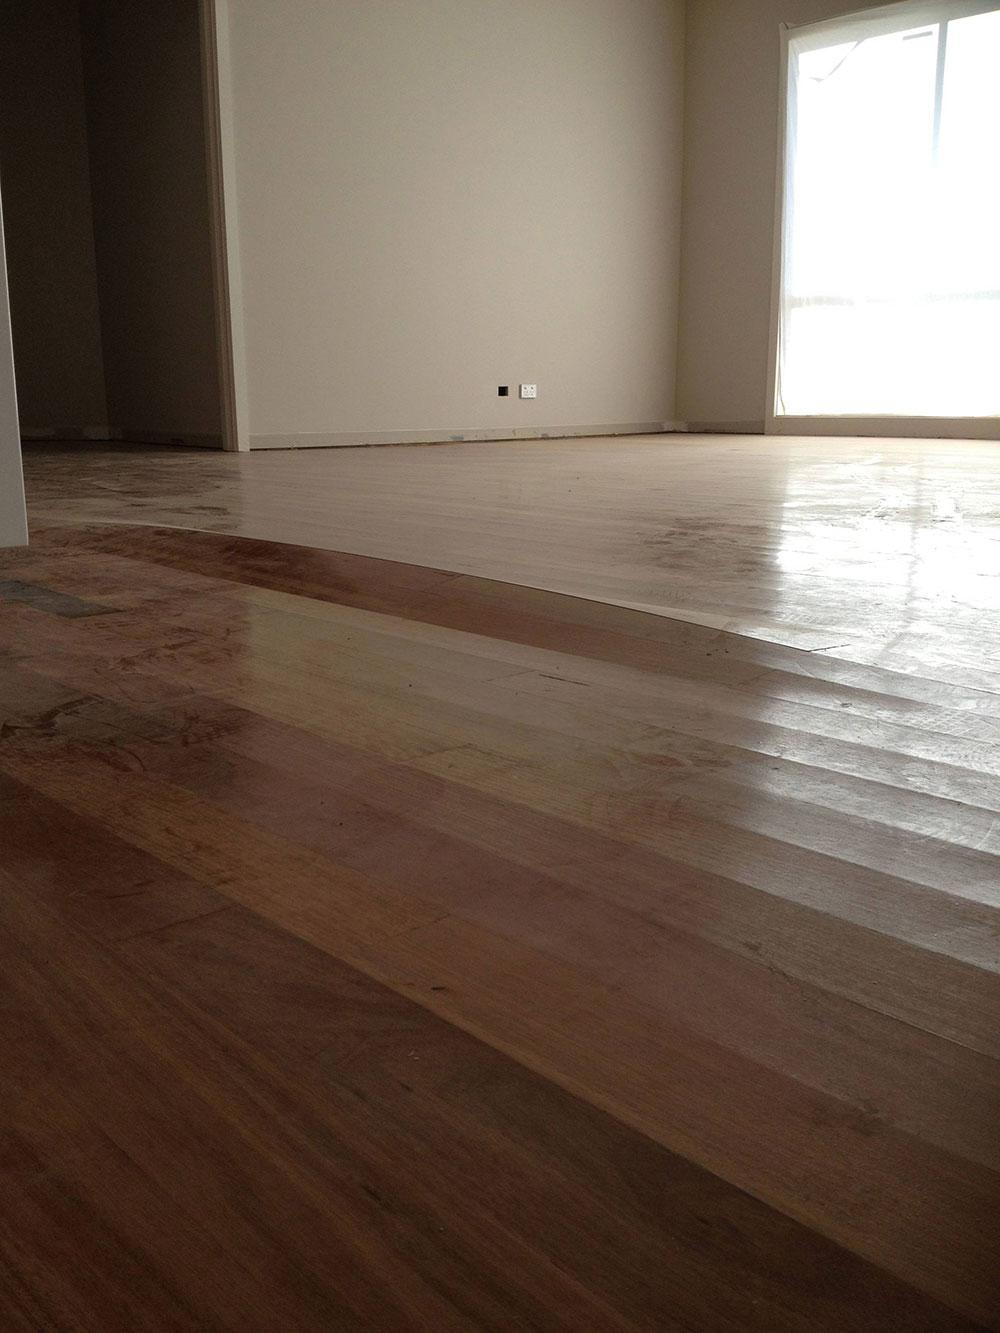 How To Repair Swollen Laminate Flooring, How To Repair Swollen Laminate Flooring